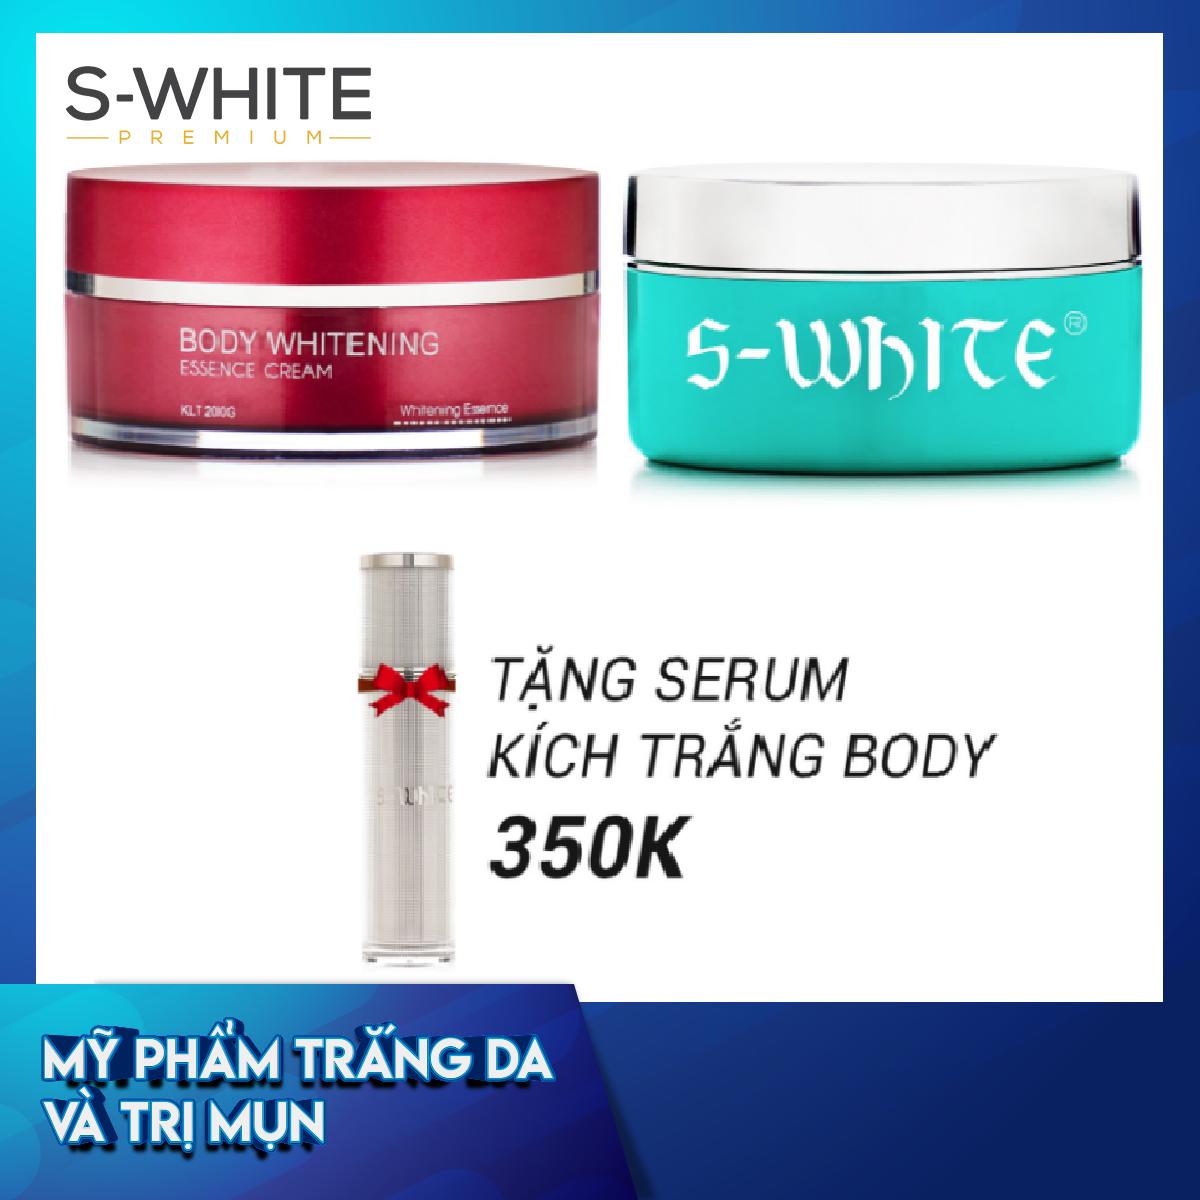 Combo da trắng mịn gồm Kem Body Cốt S-White + Kem Body Táo S-White tặng 1 Serum Kích Trắng Body S-White